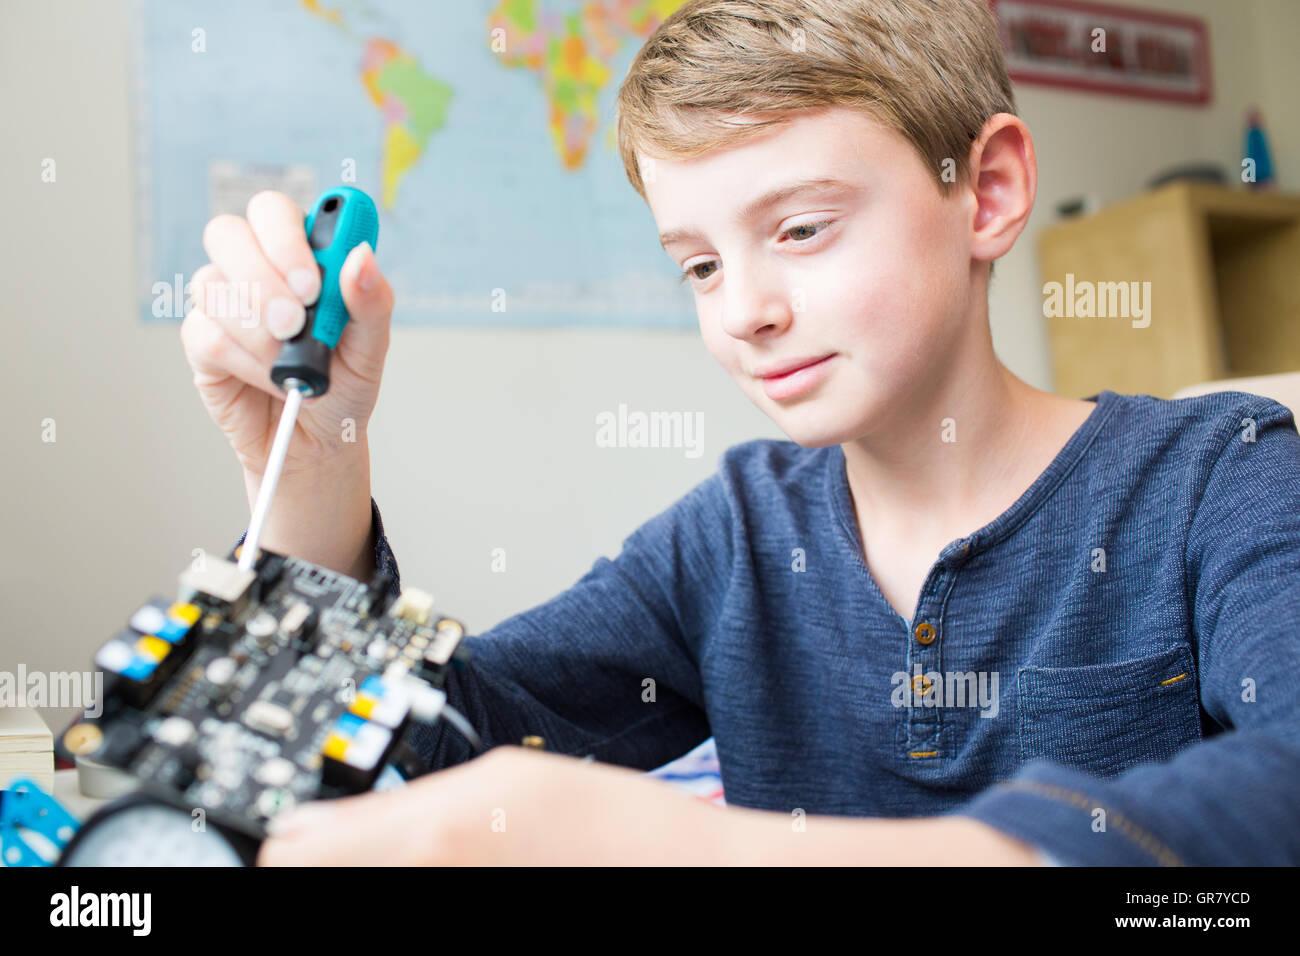 Boy Assembling Robotic Kit In Bedroom - Stock Image